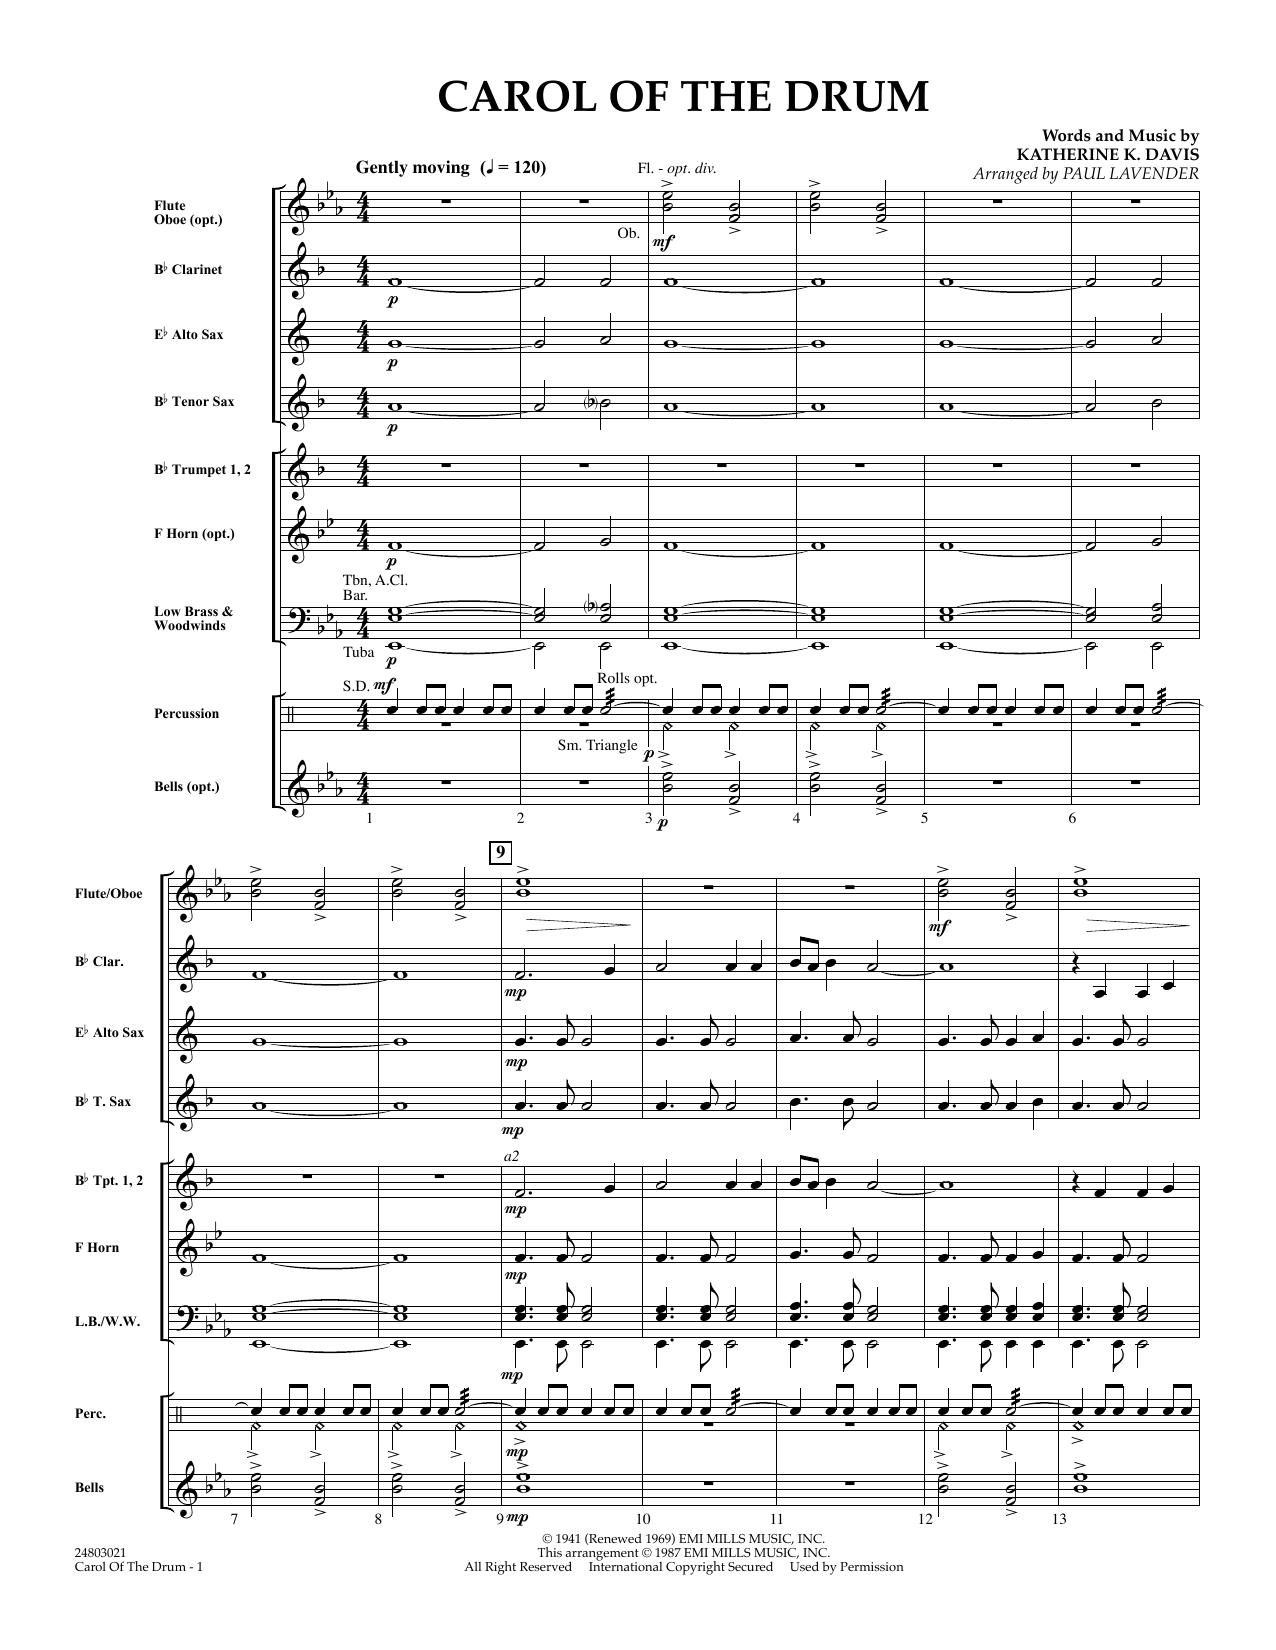 Carol of the Drum - Full Score sheet music